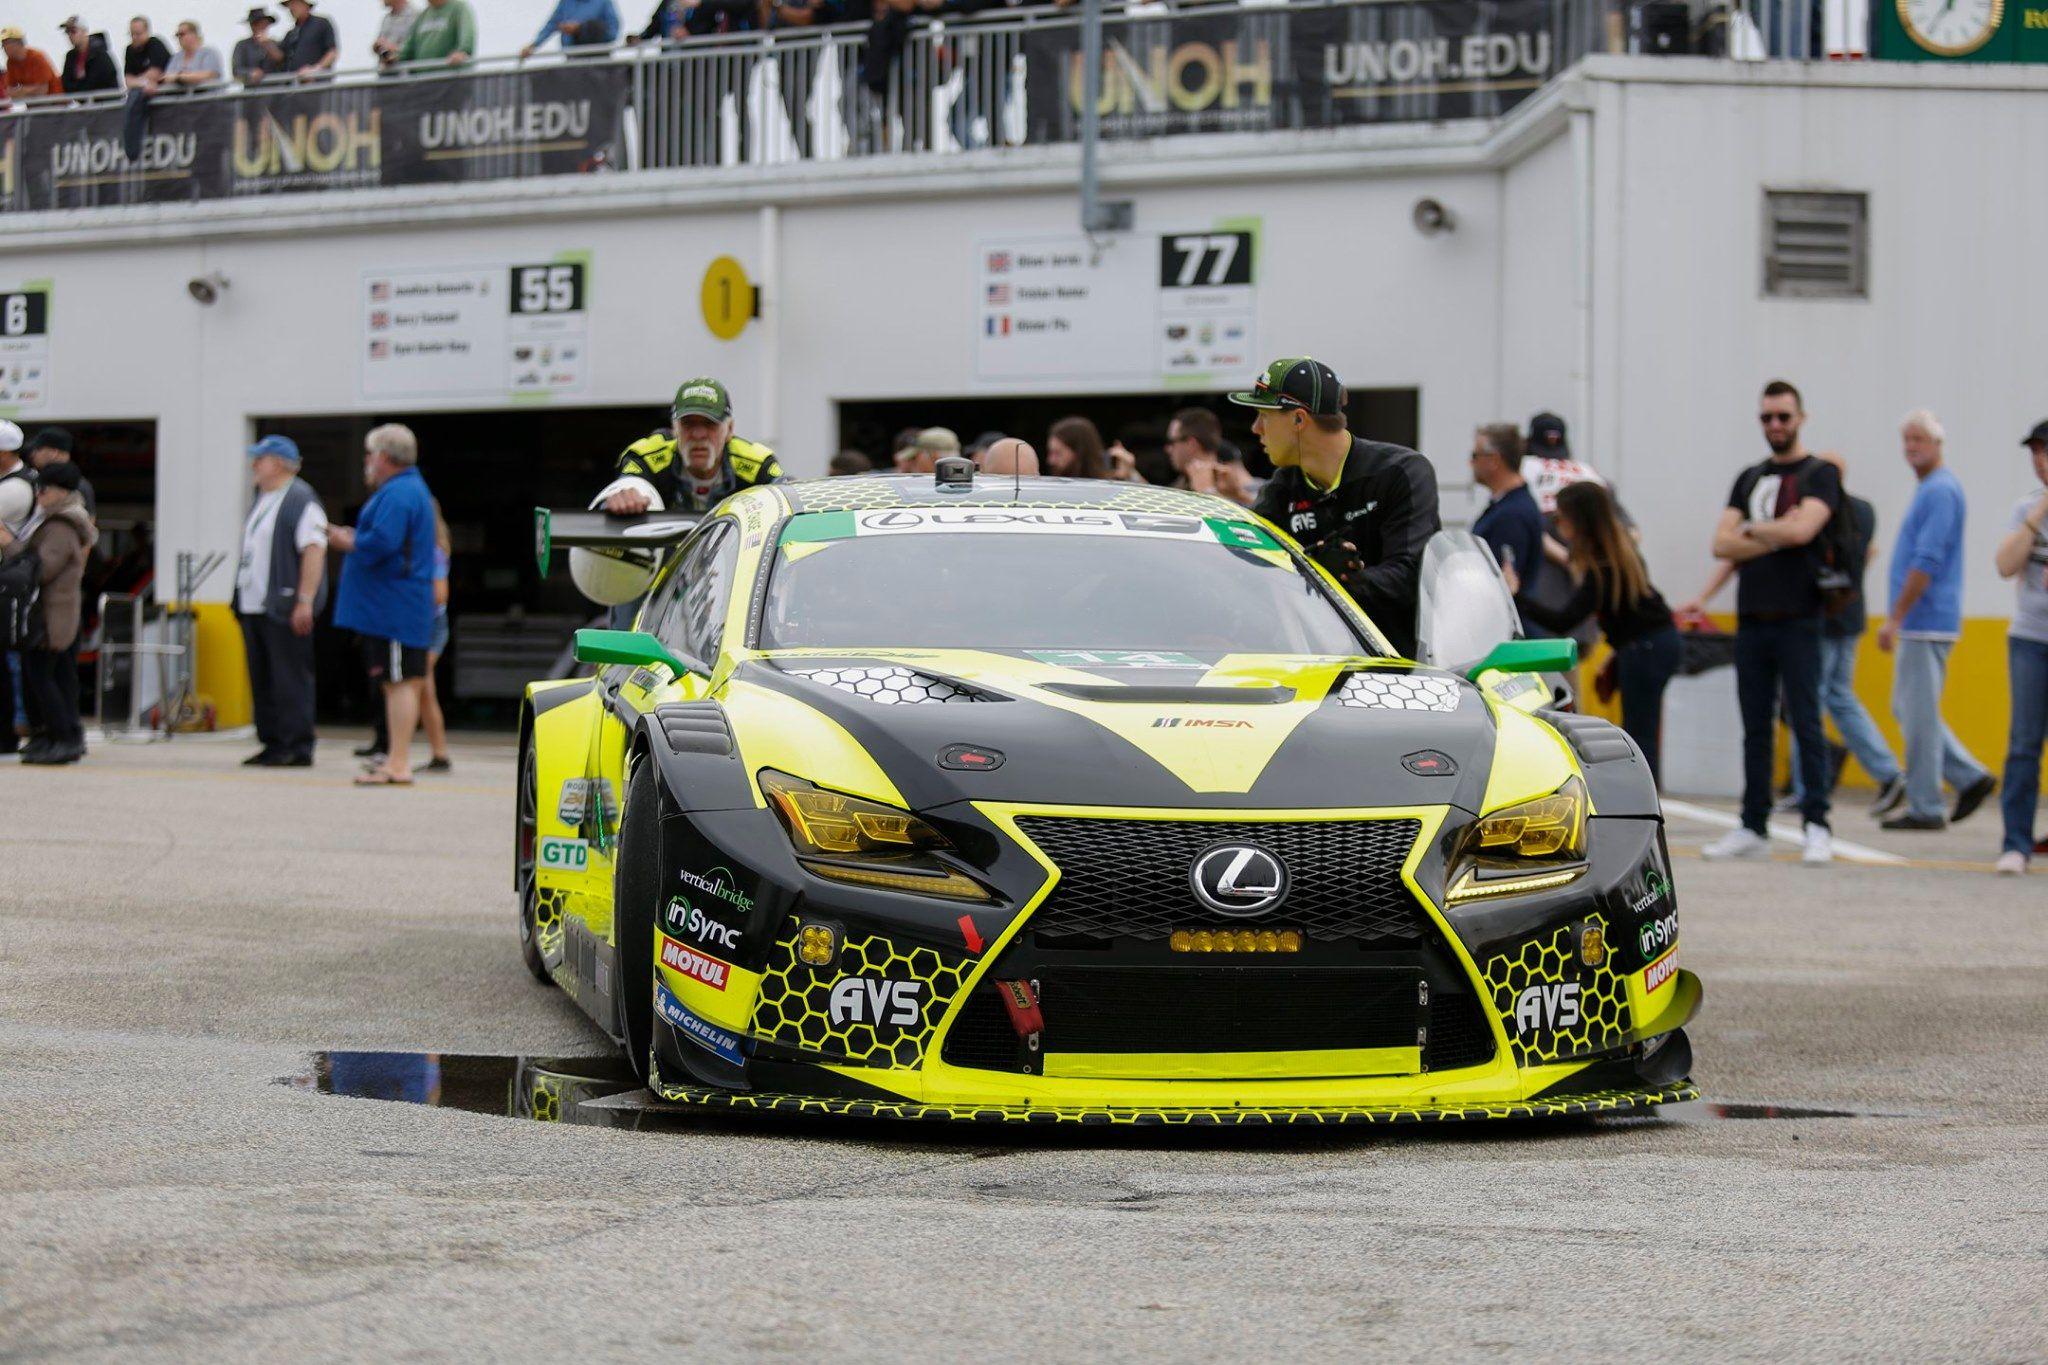 2020 Rolex 24 Tv Schedule Starting Lineup Info In 2020 Tv Schedule Sports Car Racing Racing News